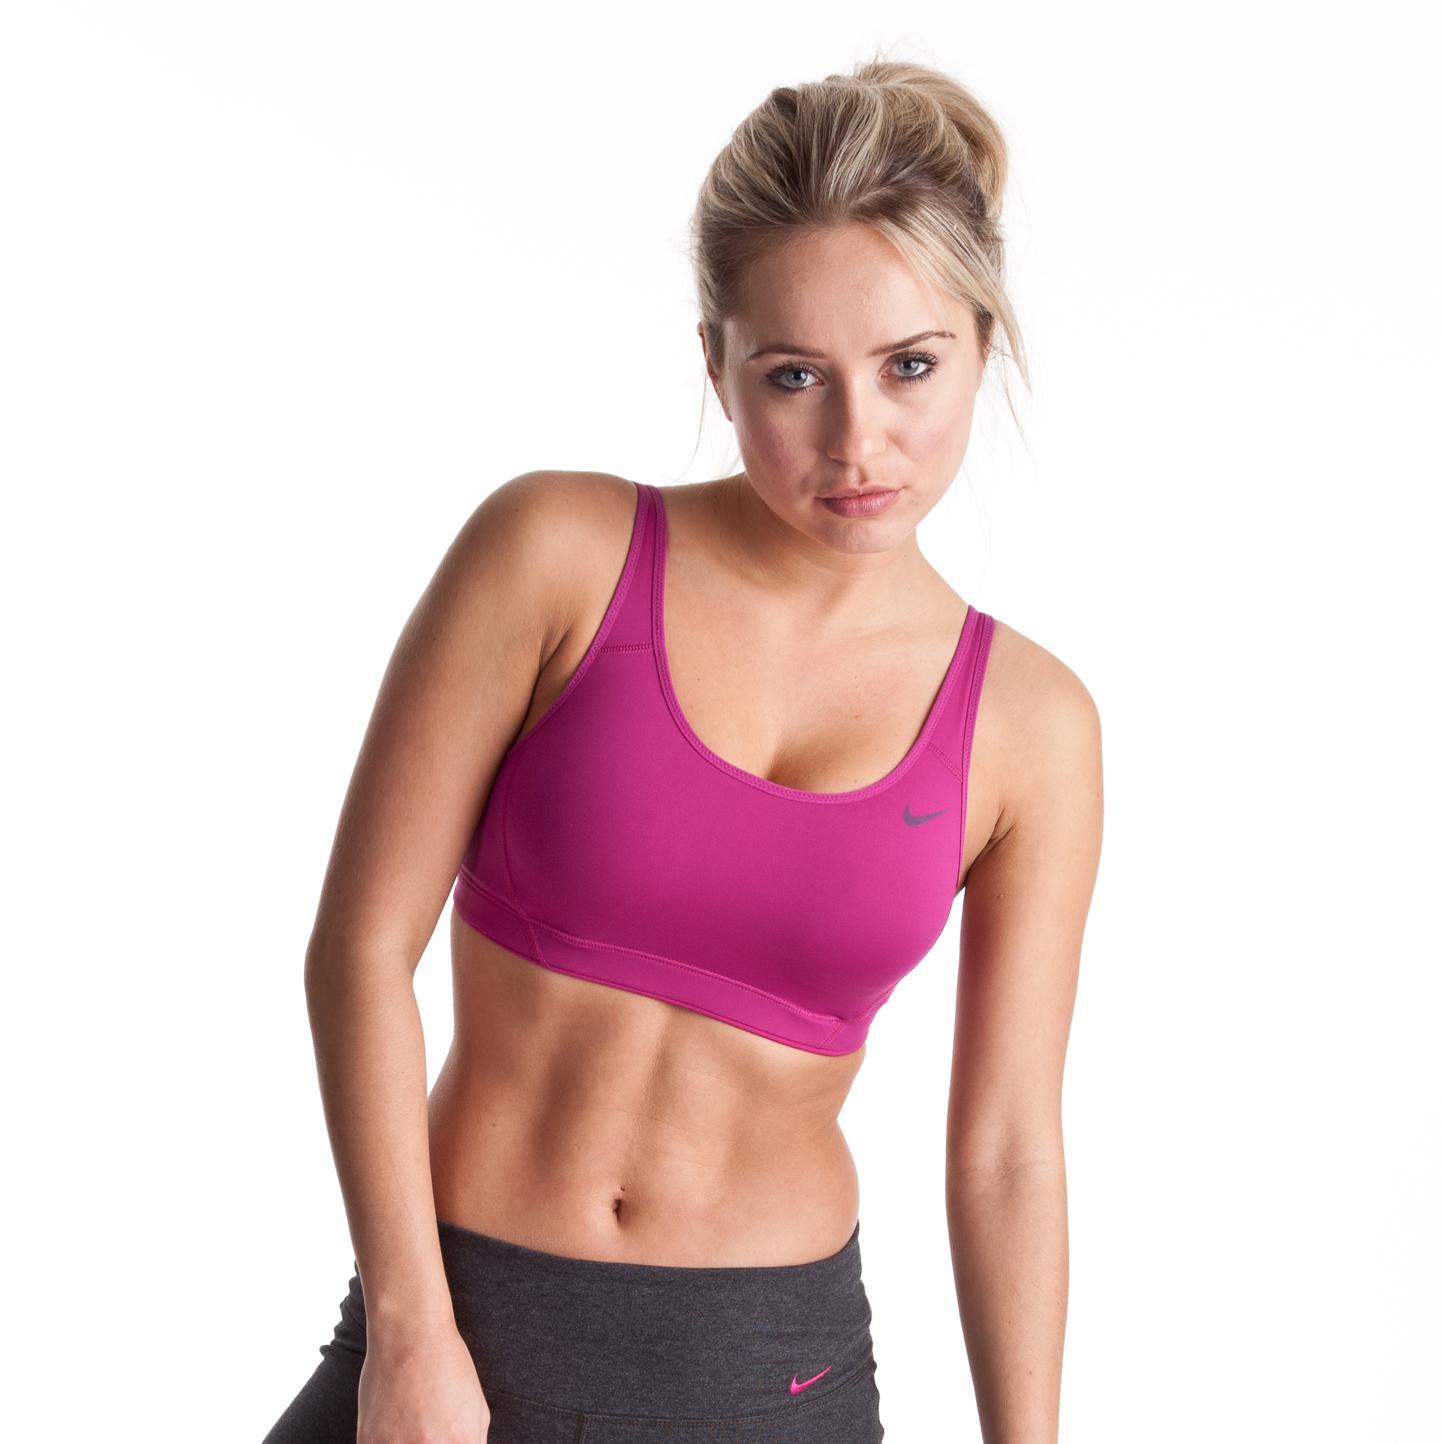 Nike Adjust U-Bra - Rave Pink/Cool Grey/Cool Grey - Womens